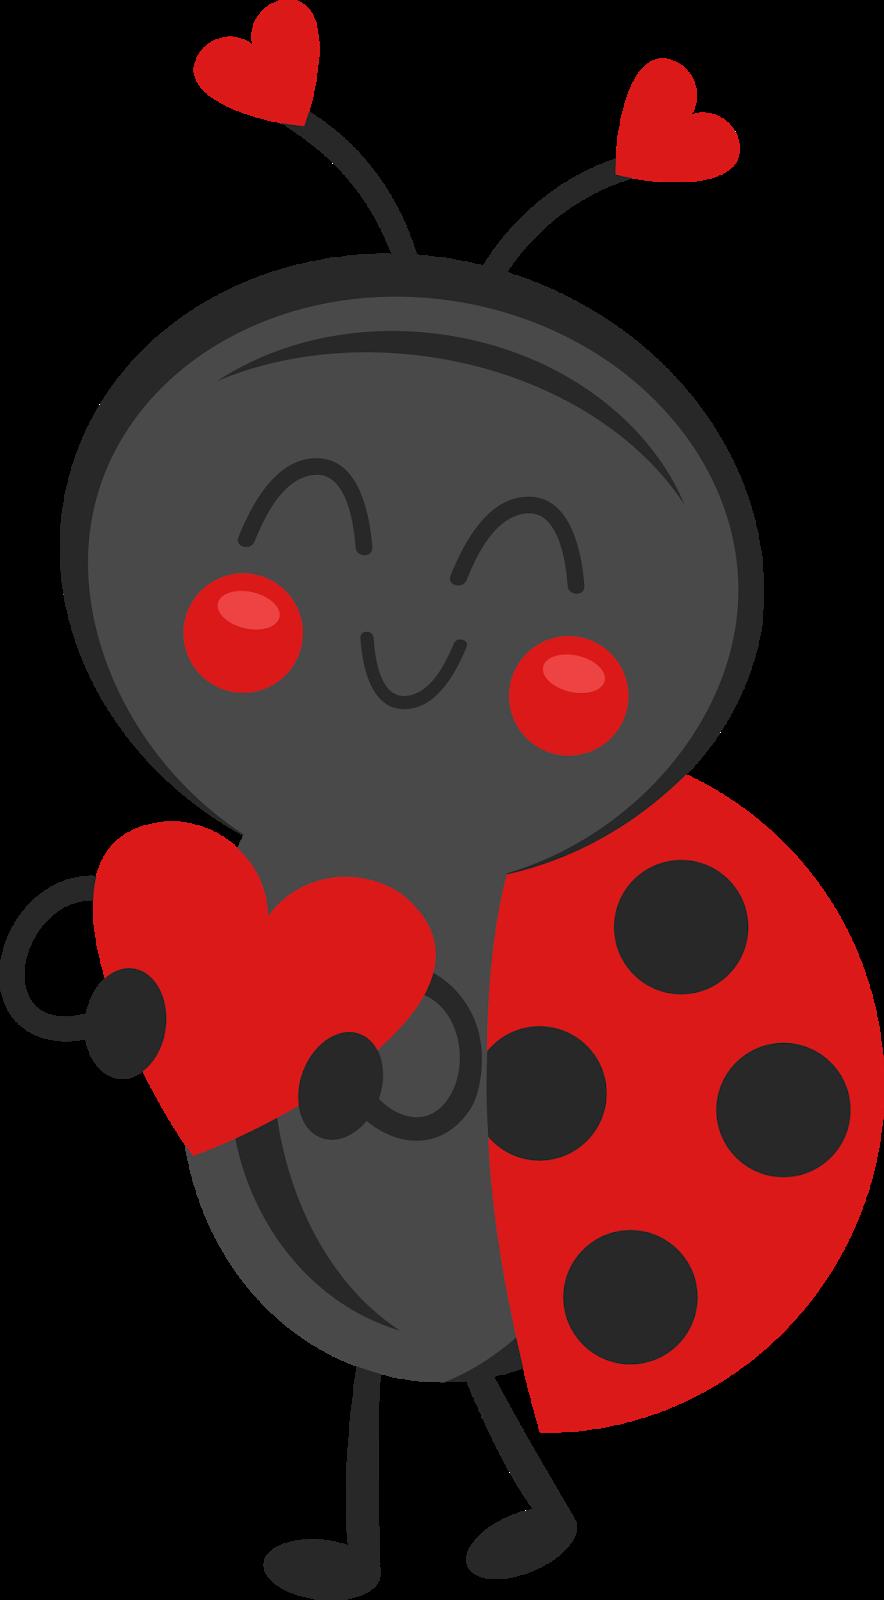 Lady beetle scrapbook bugs. Ladybug clipart valentine